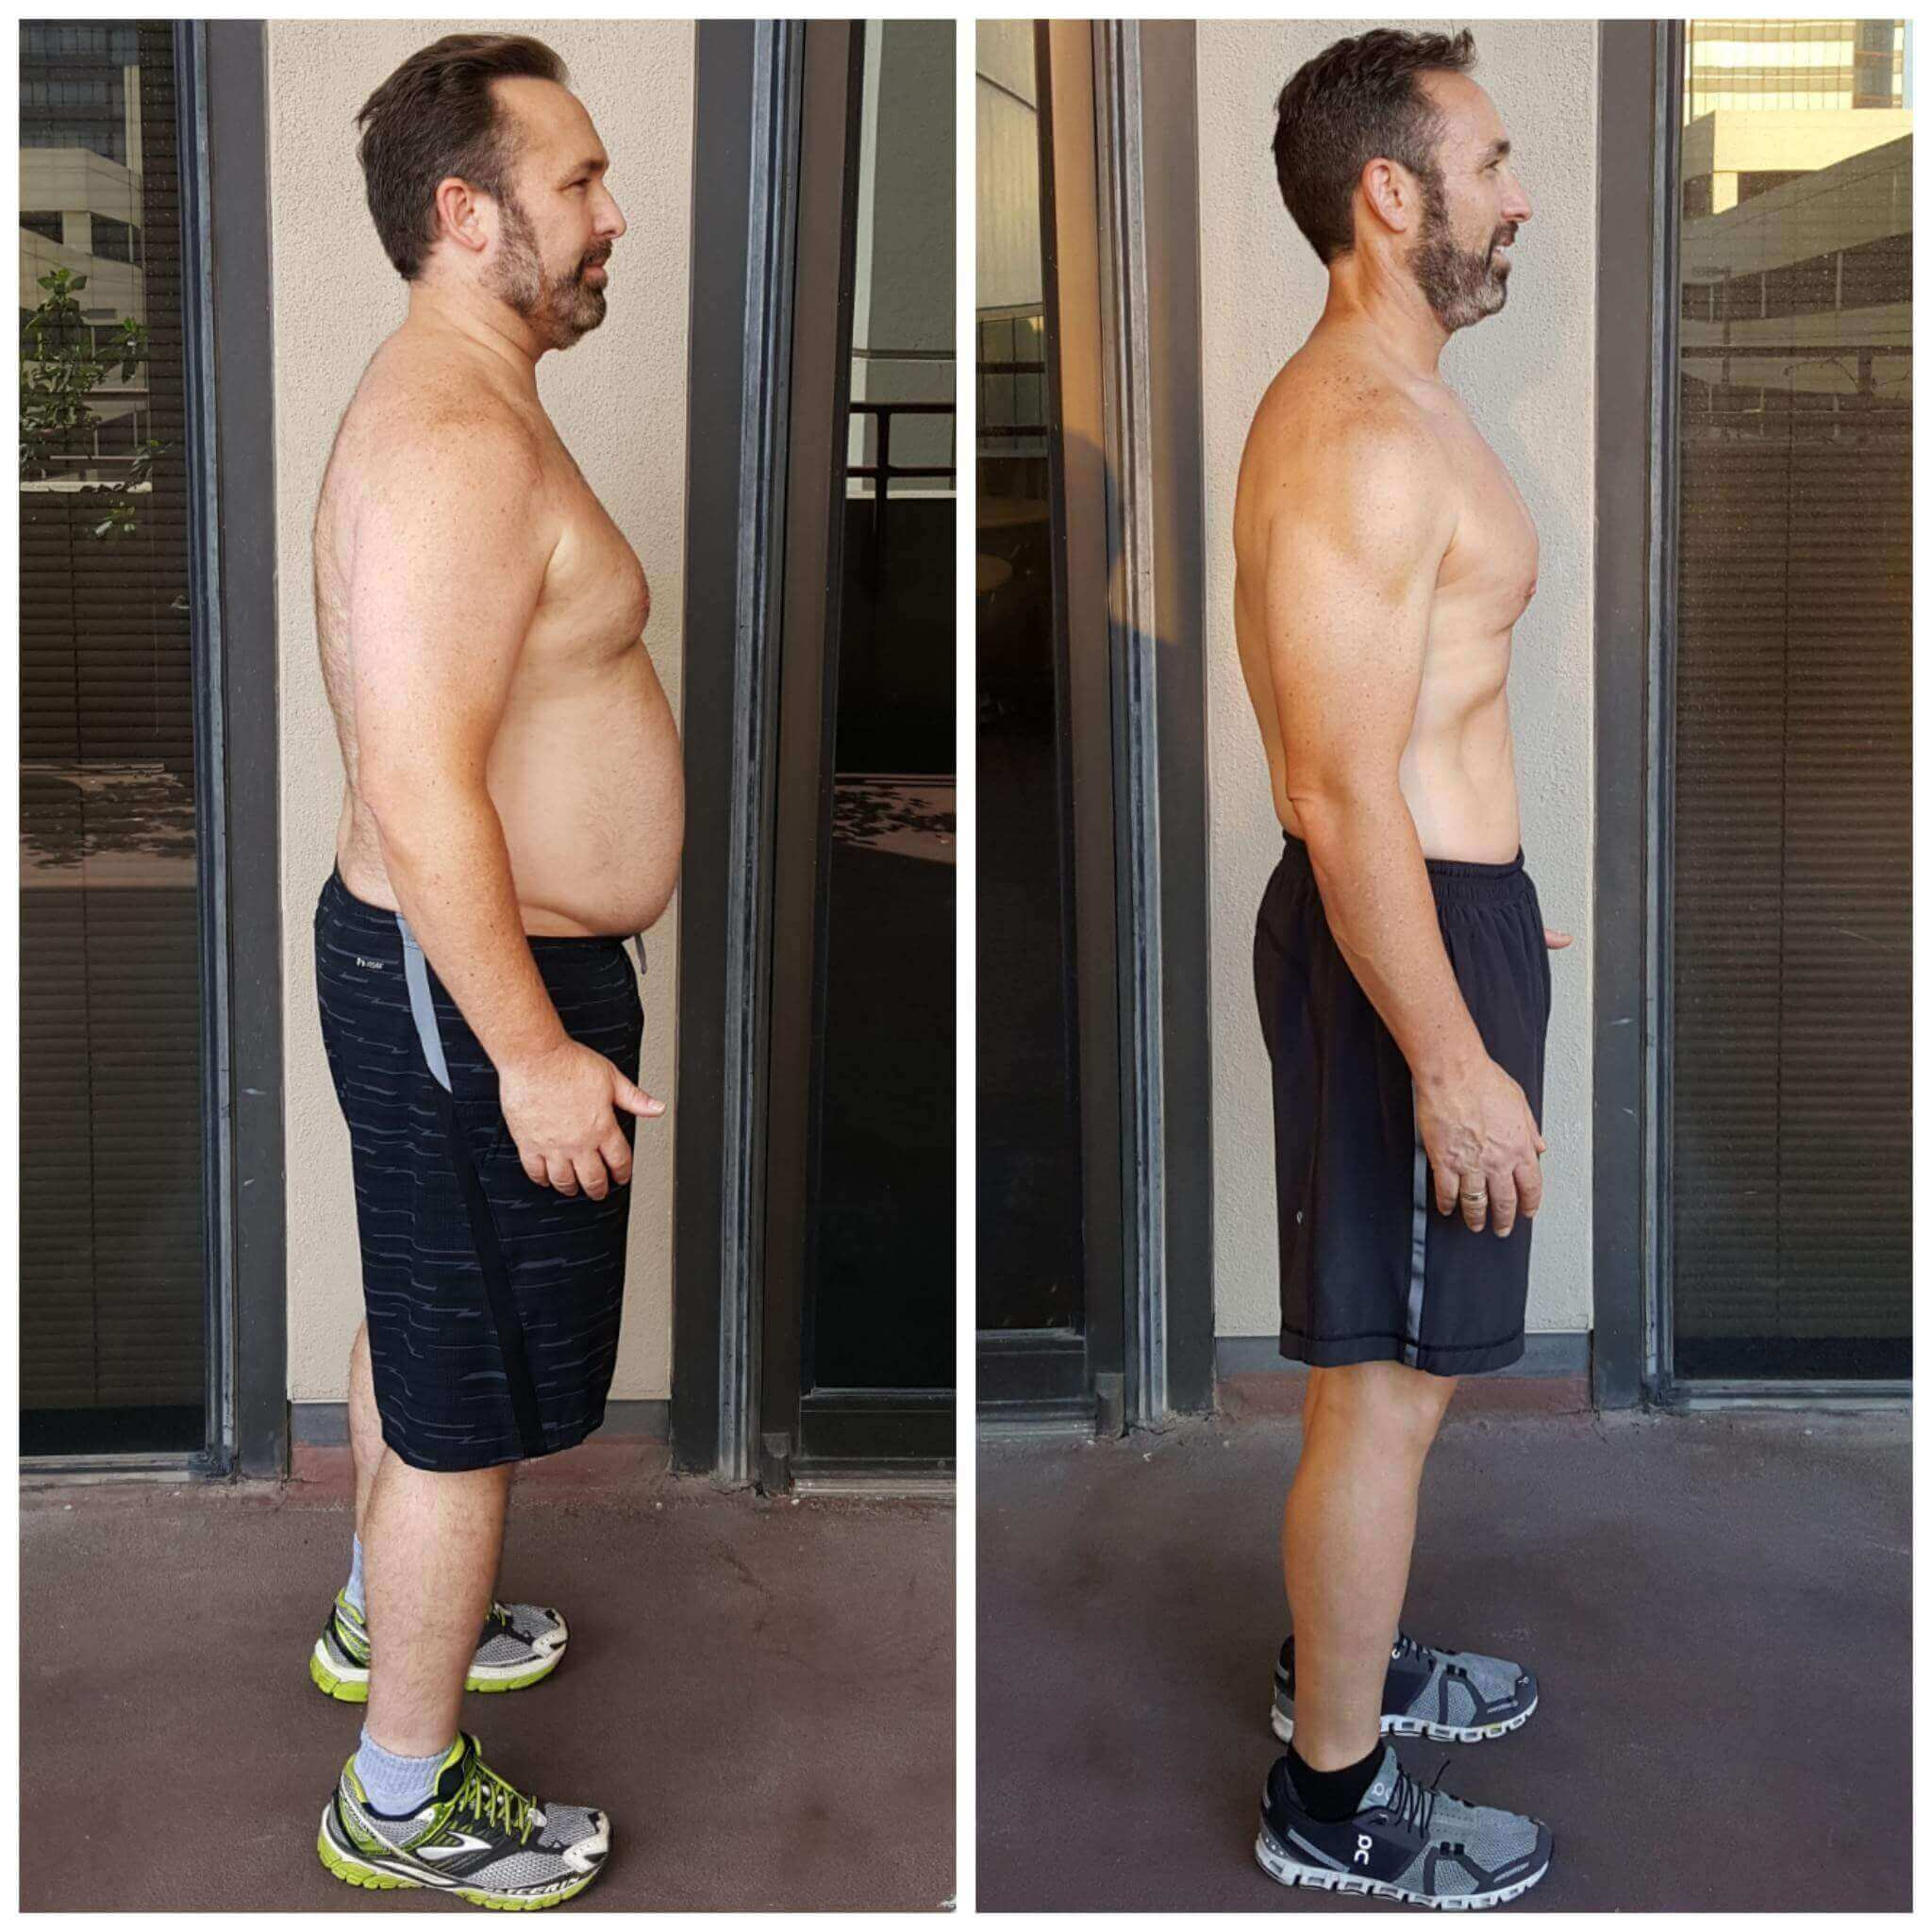 Brian weight loss personal training Dallas